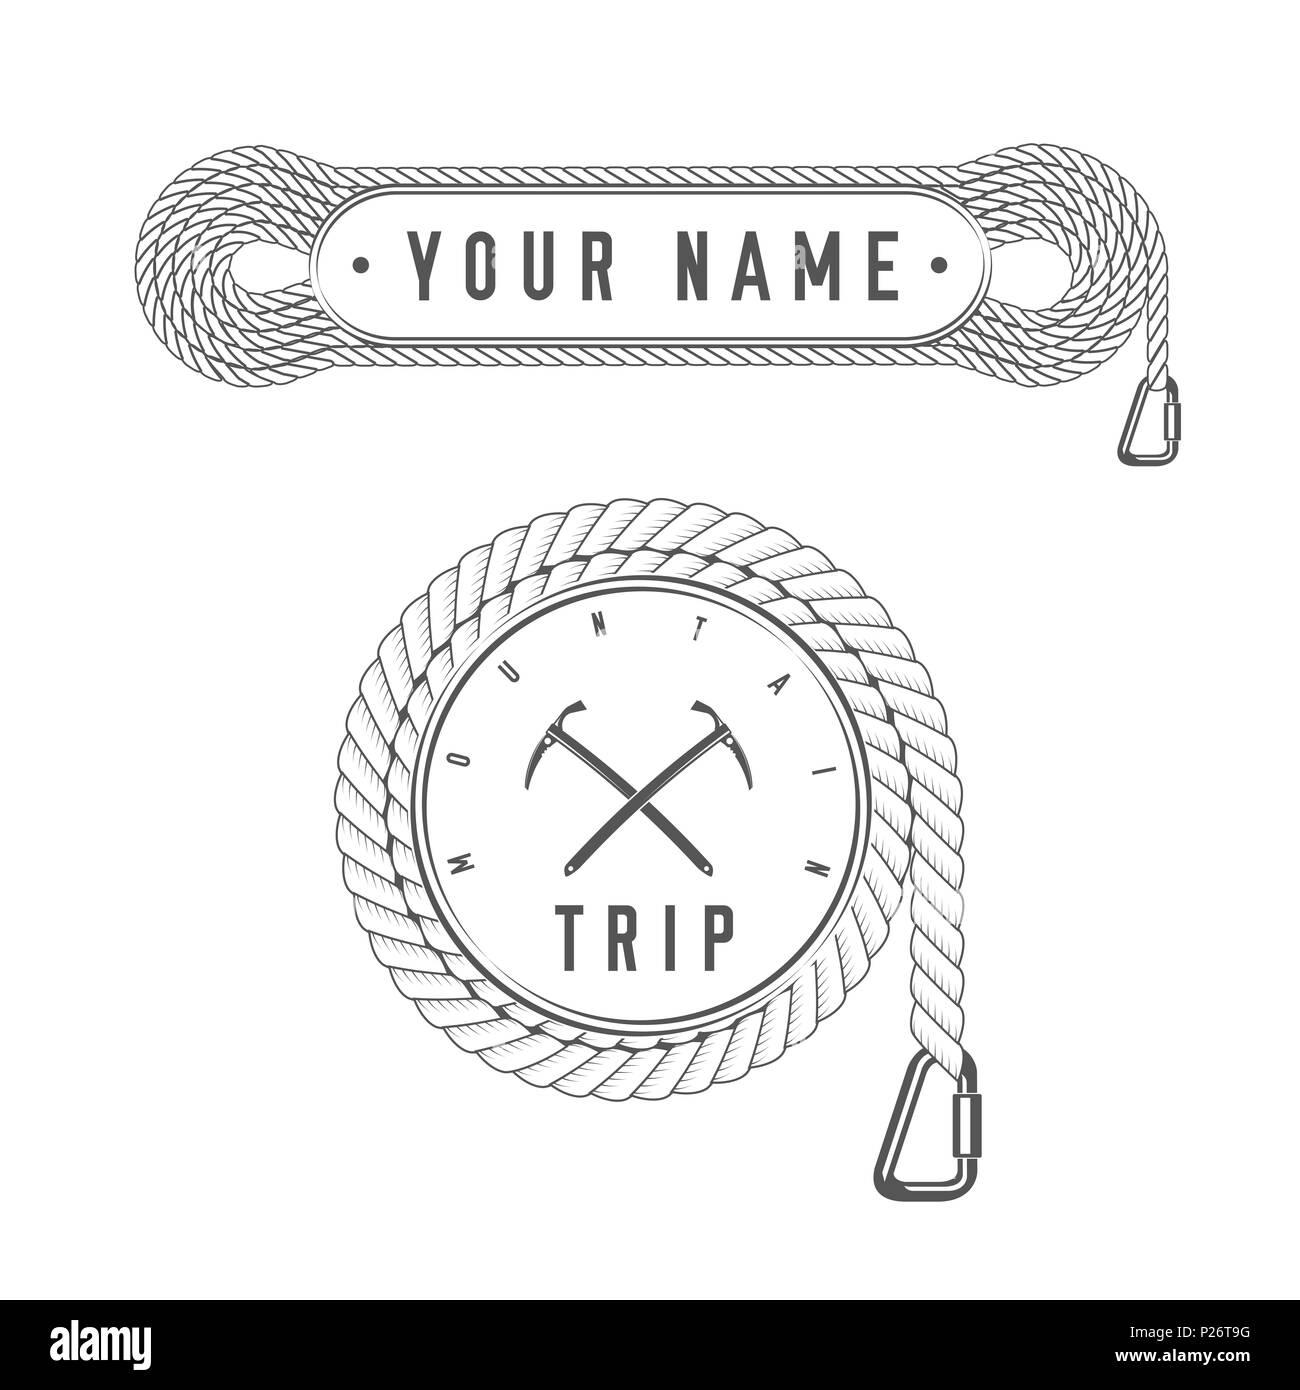 Viaje de escalada - Mountain Adventure - Alpine Club emblema - Icono ...